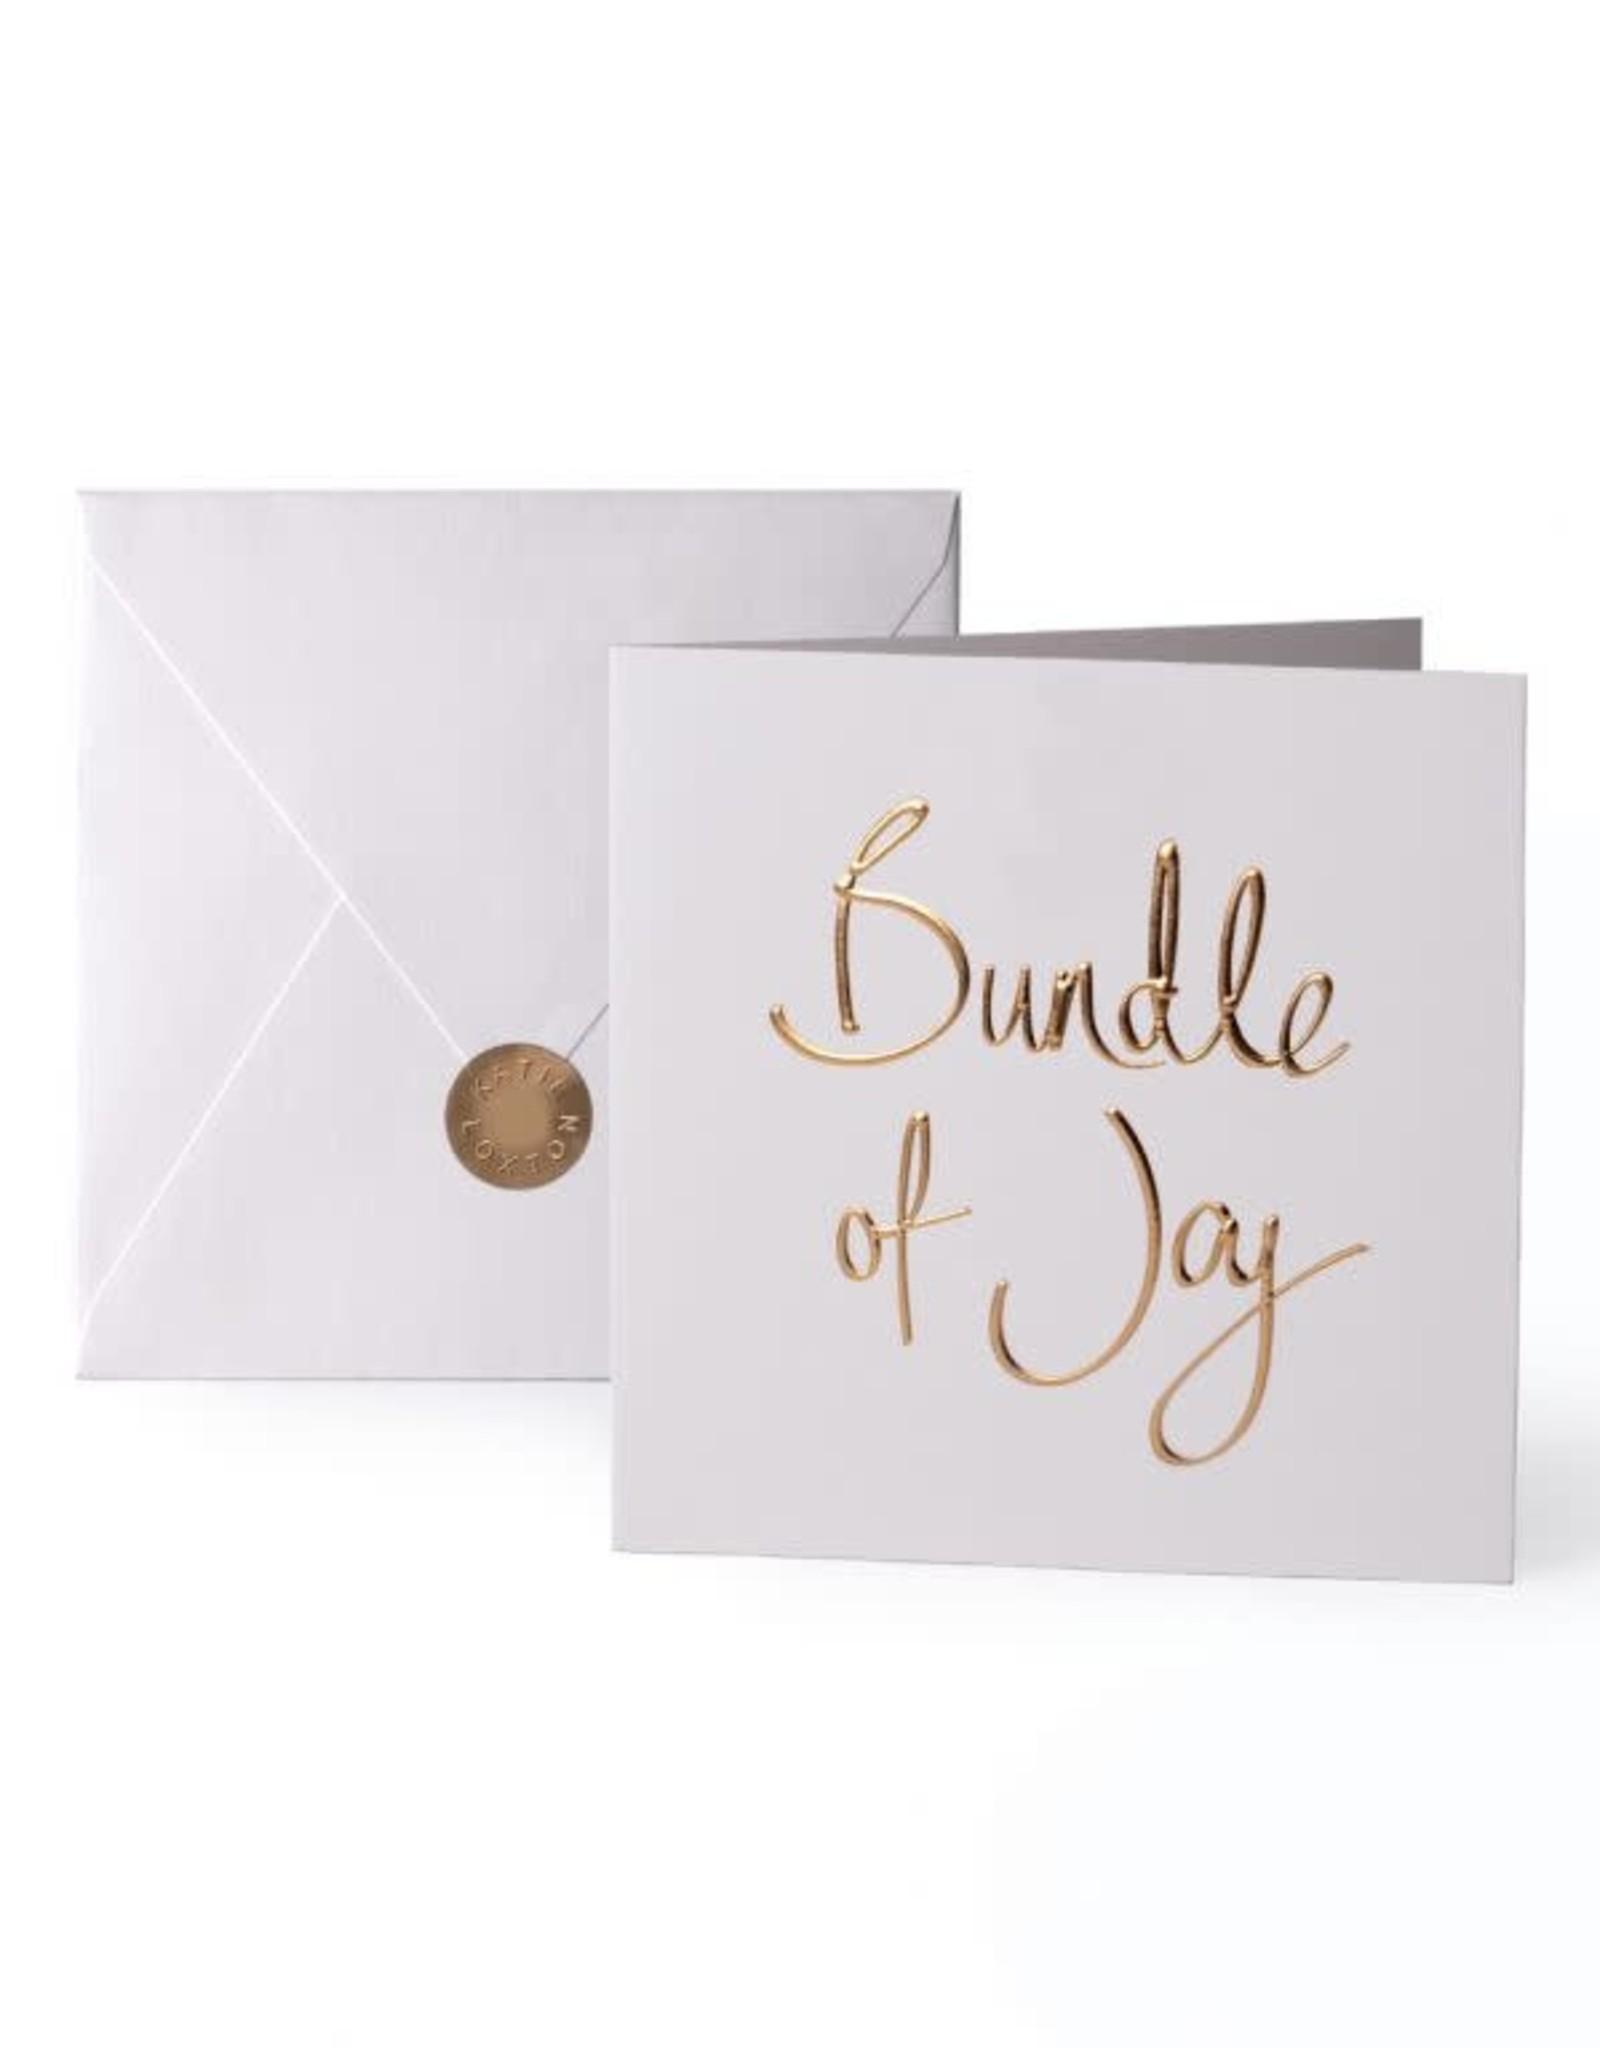 Katie Loxton Greeting Card-Bundle of Joy